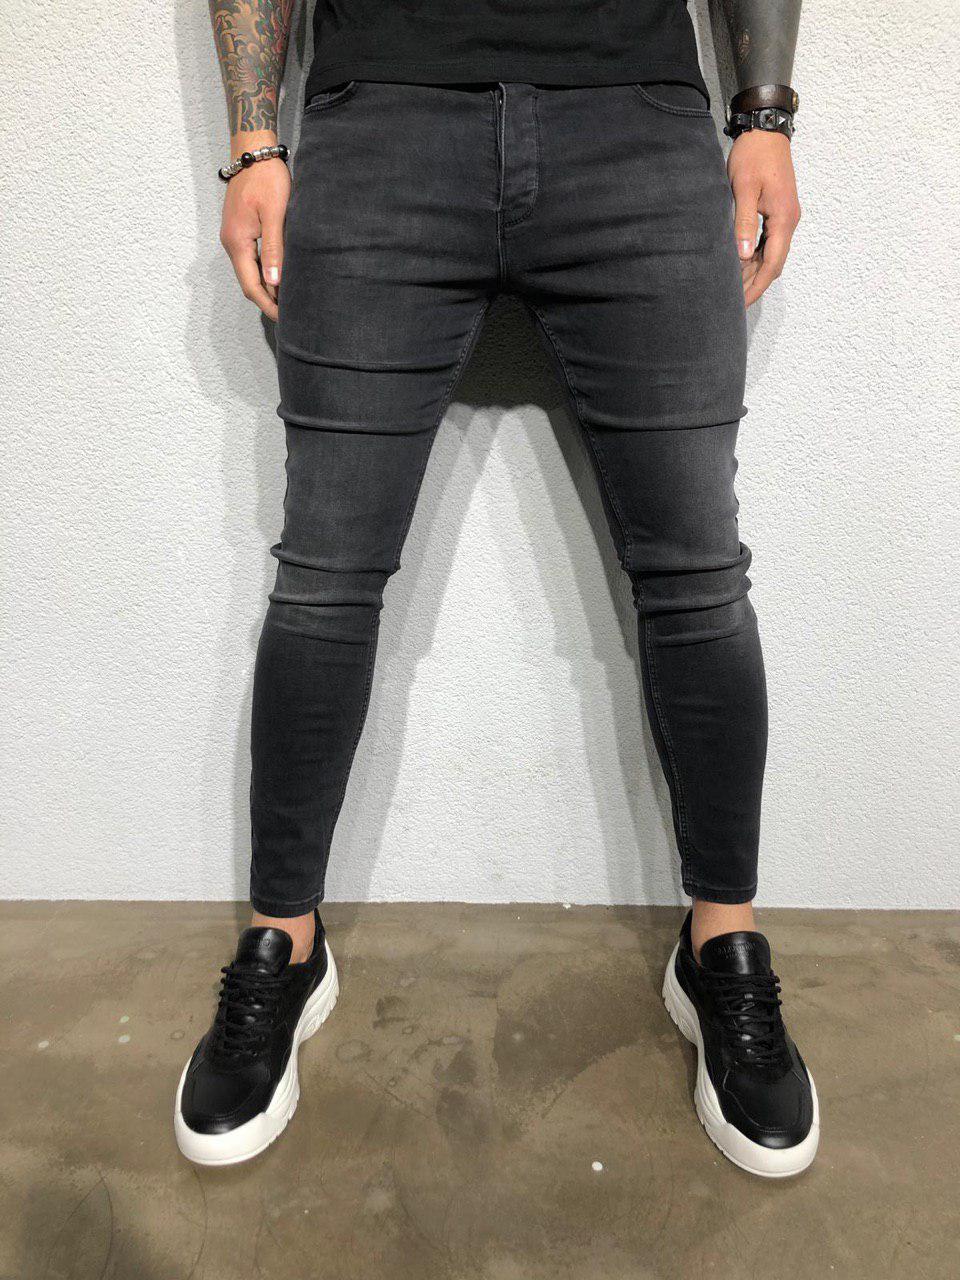 e3a27db41dd Мужские джинсы зауженные темно-серые 5093-3363  продажа